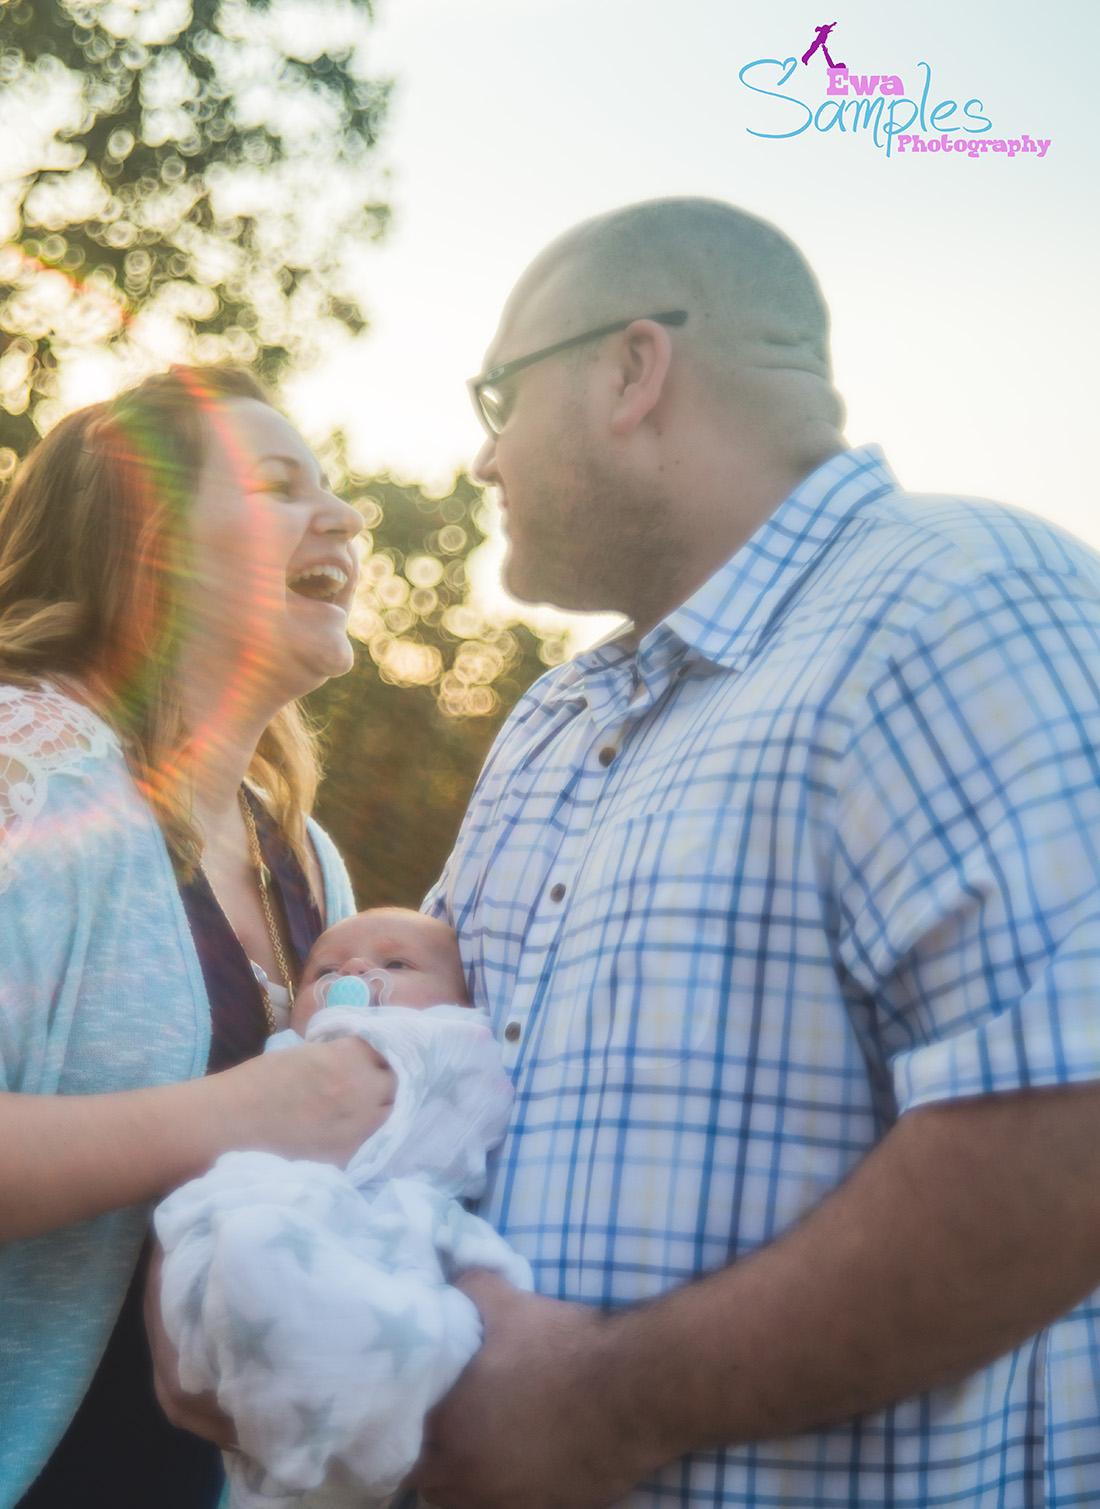 lifestyle_newborn_photographer_los_alto_cupertino_ewa_samples_photography_1